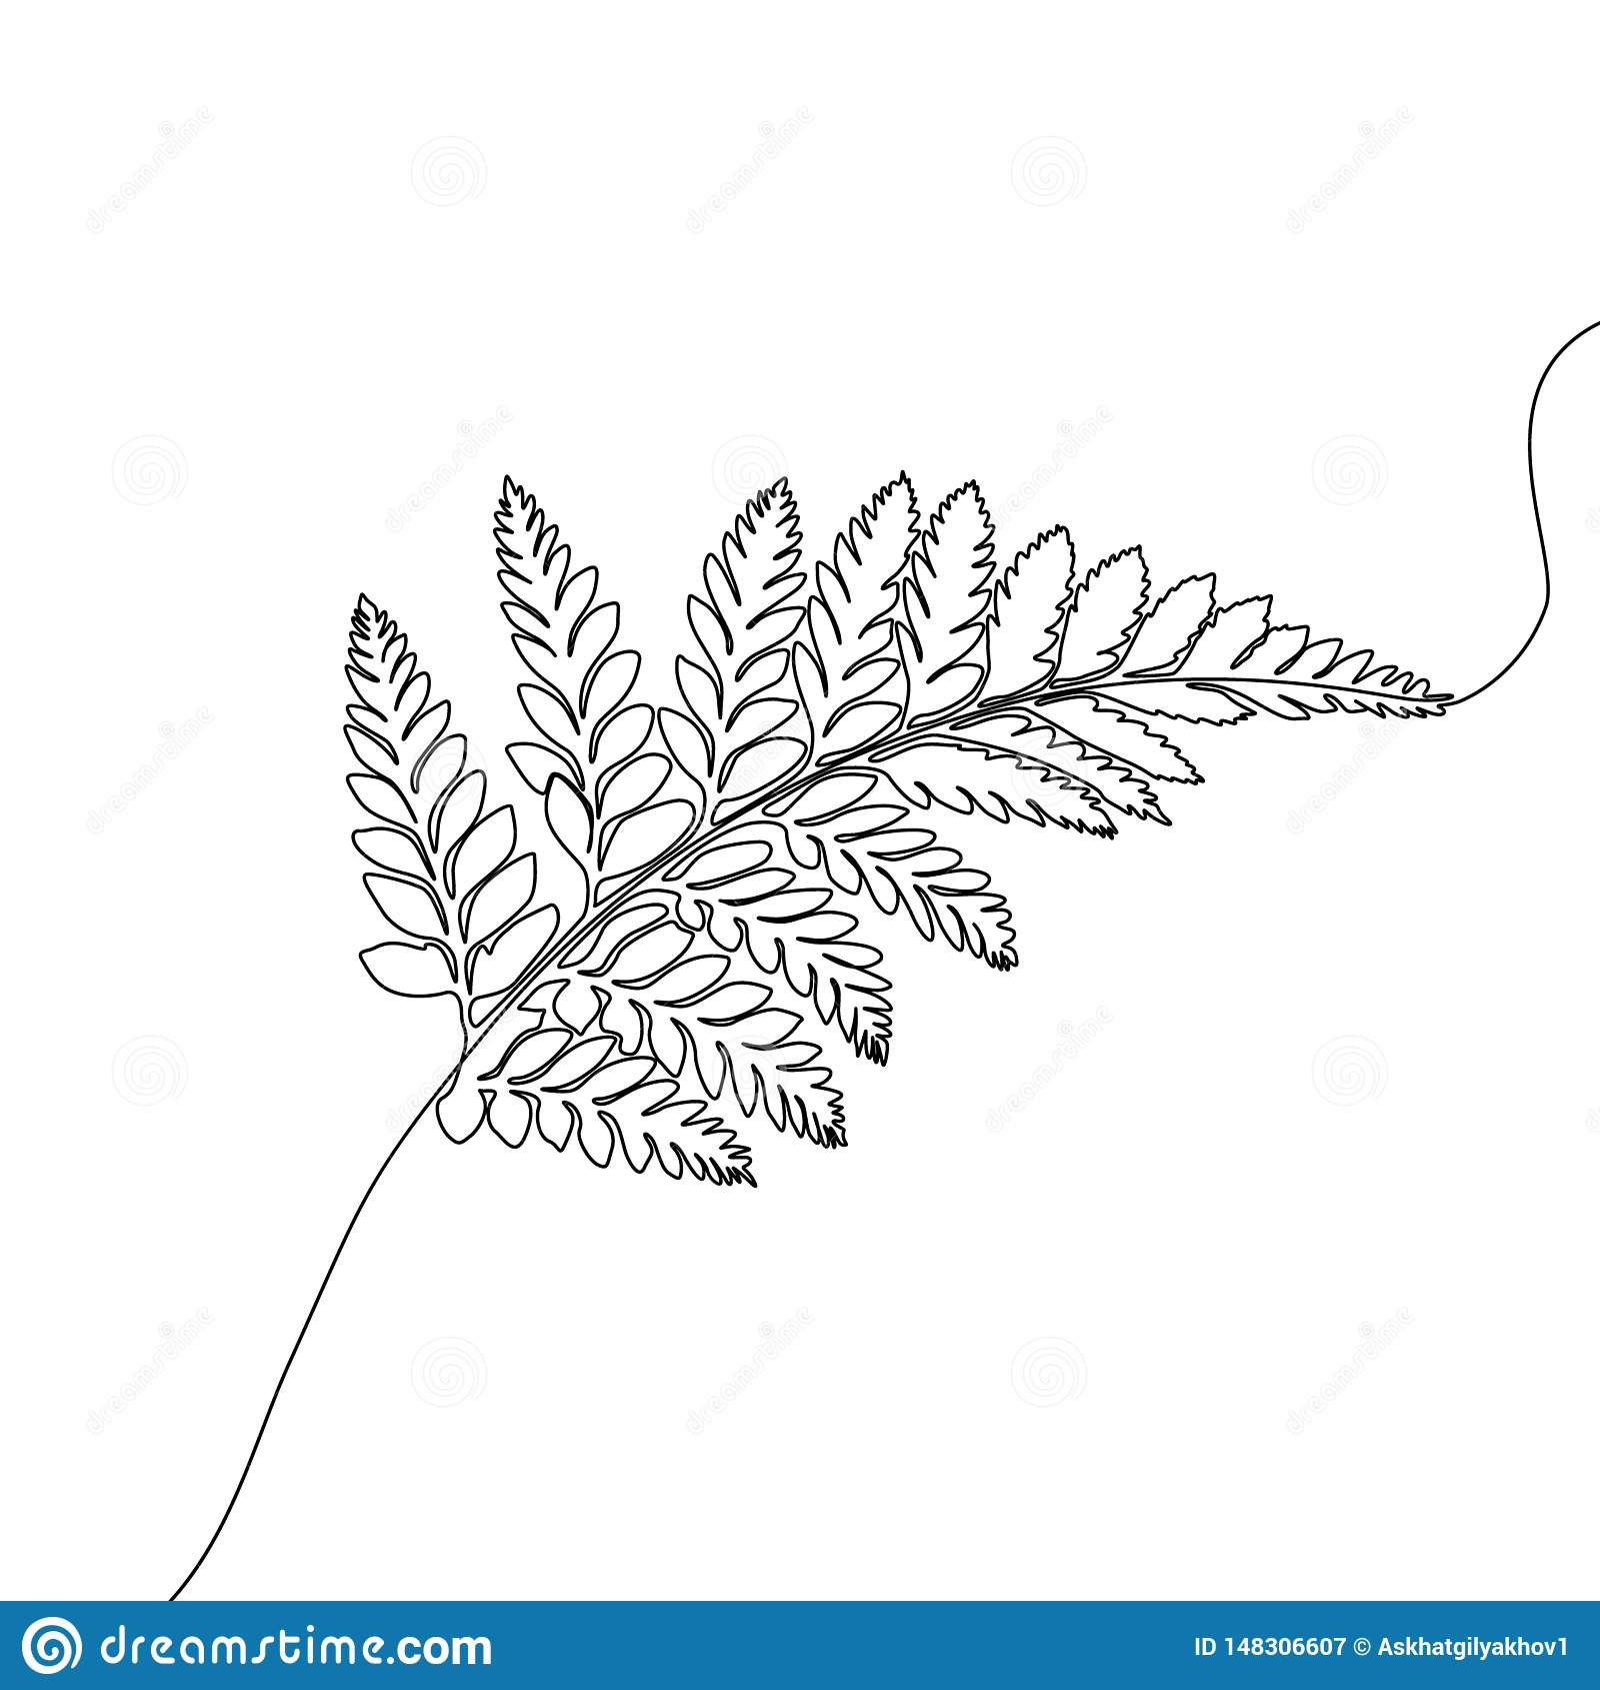 Un helecho continuo del dibujo lineal, planta tropical exótica